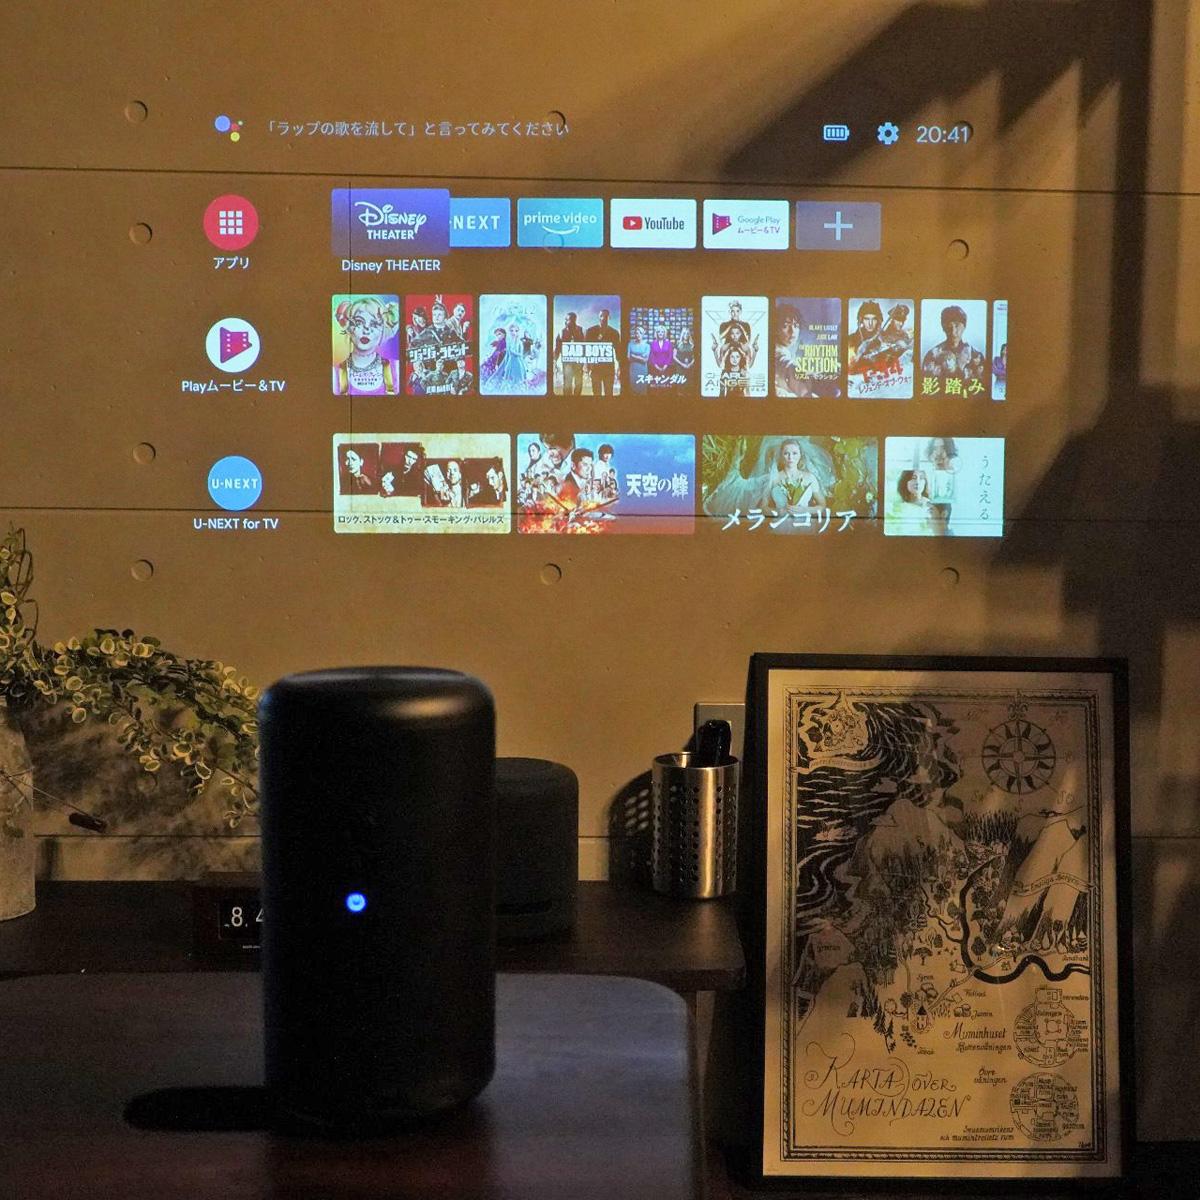 Amazonプライム・ビデオを大画面で手軽に視聴できるWi-Fi内蔵プロジェクターの選び方